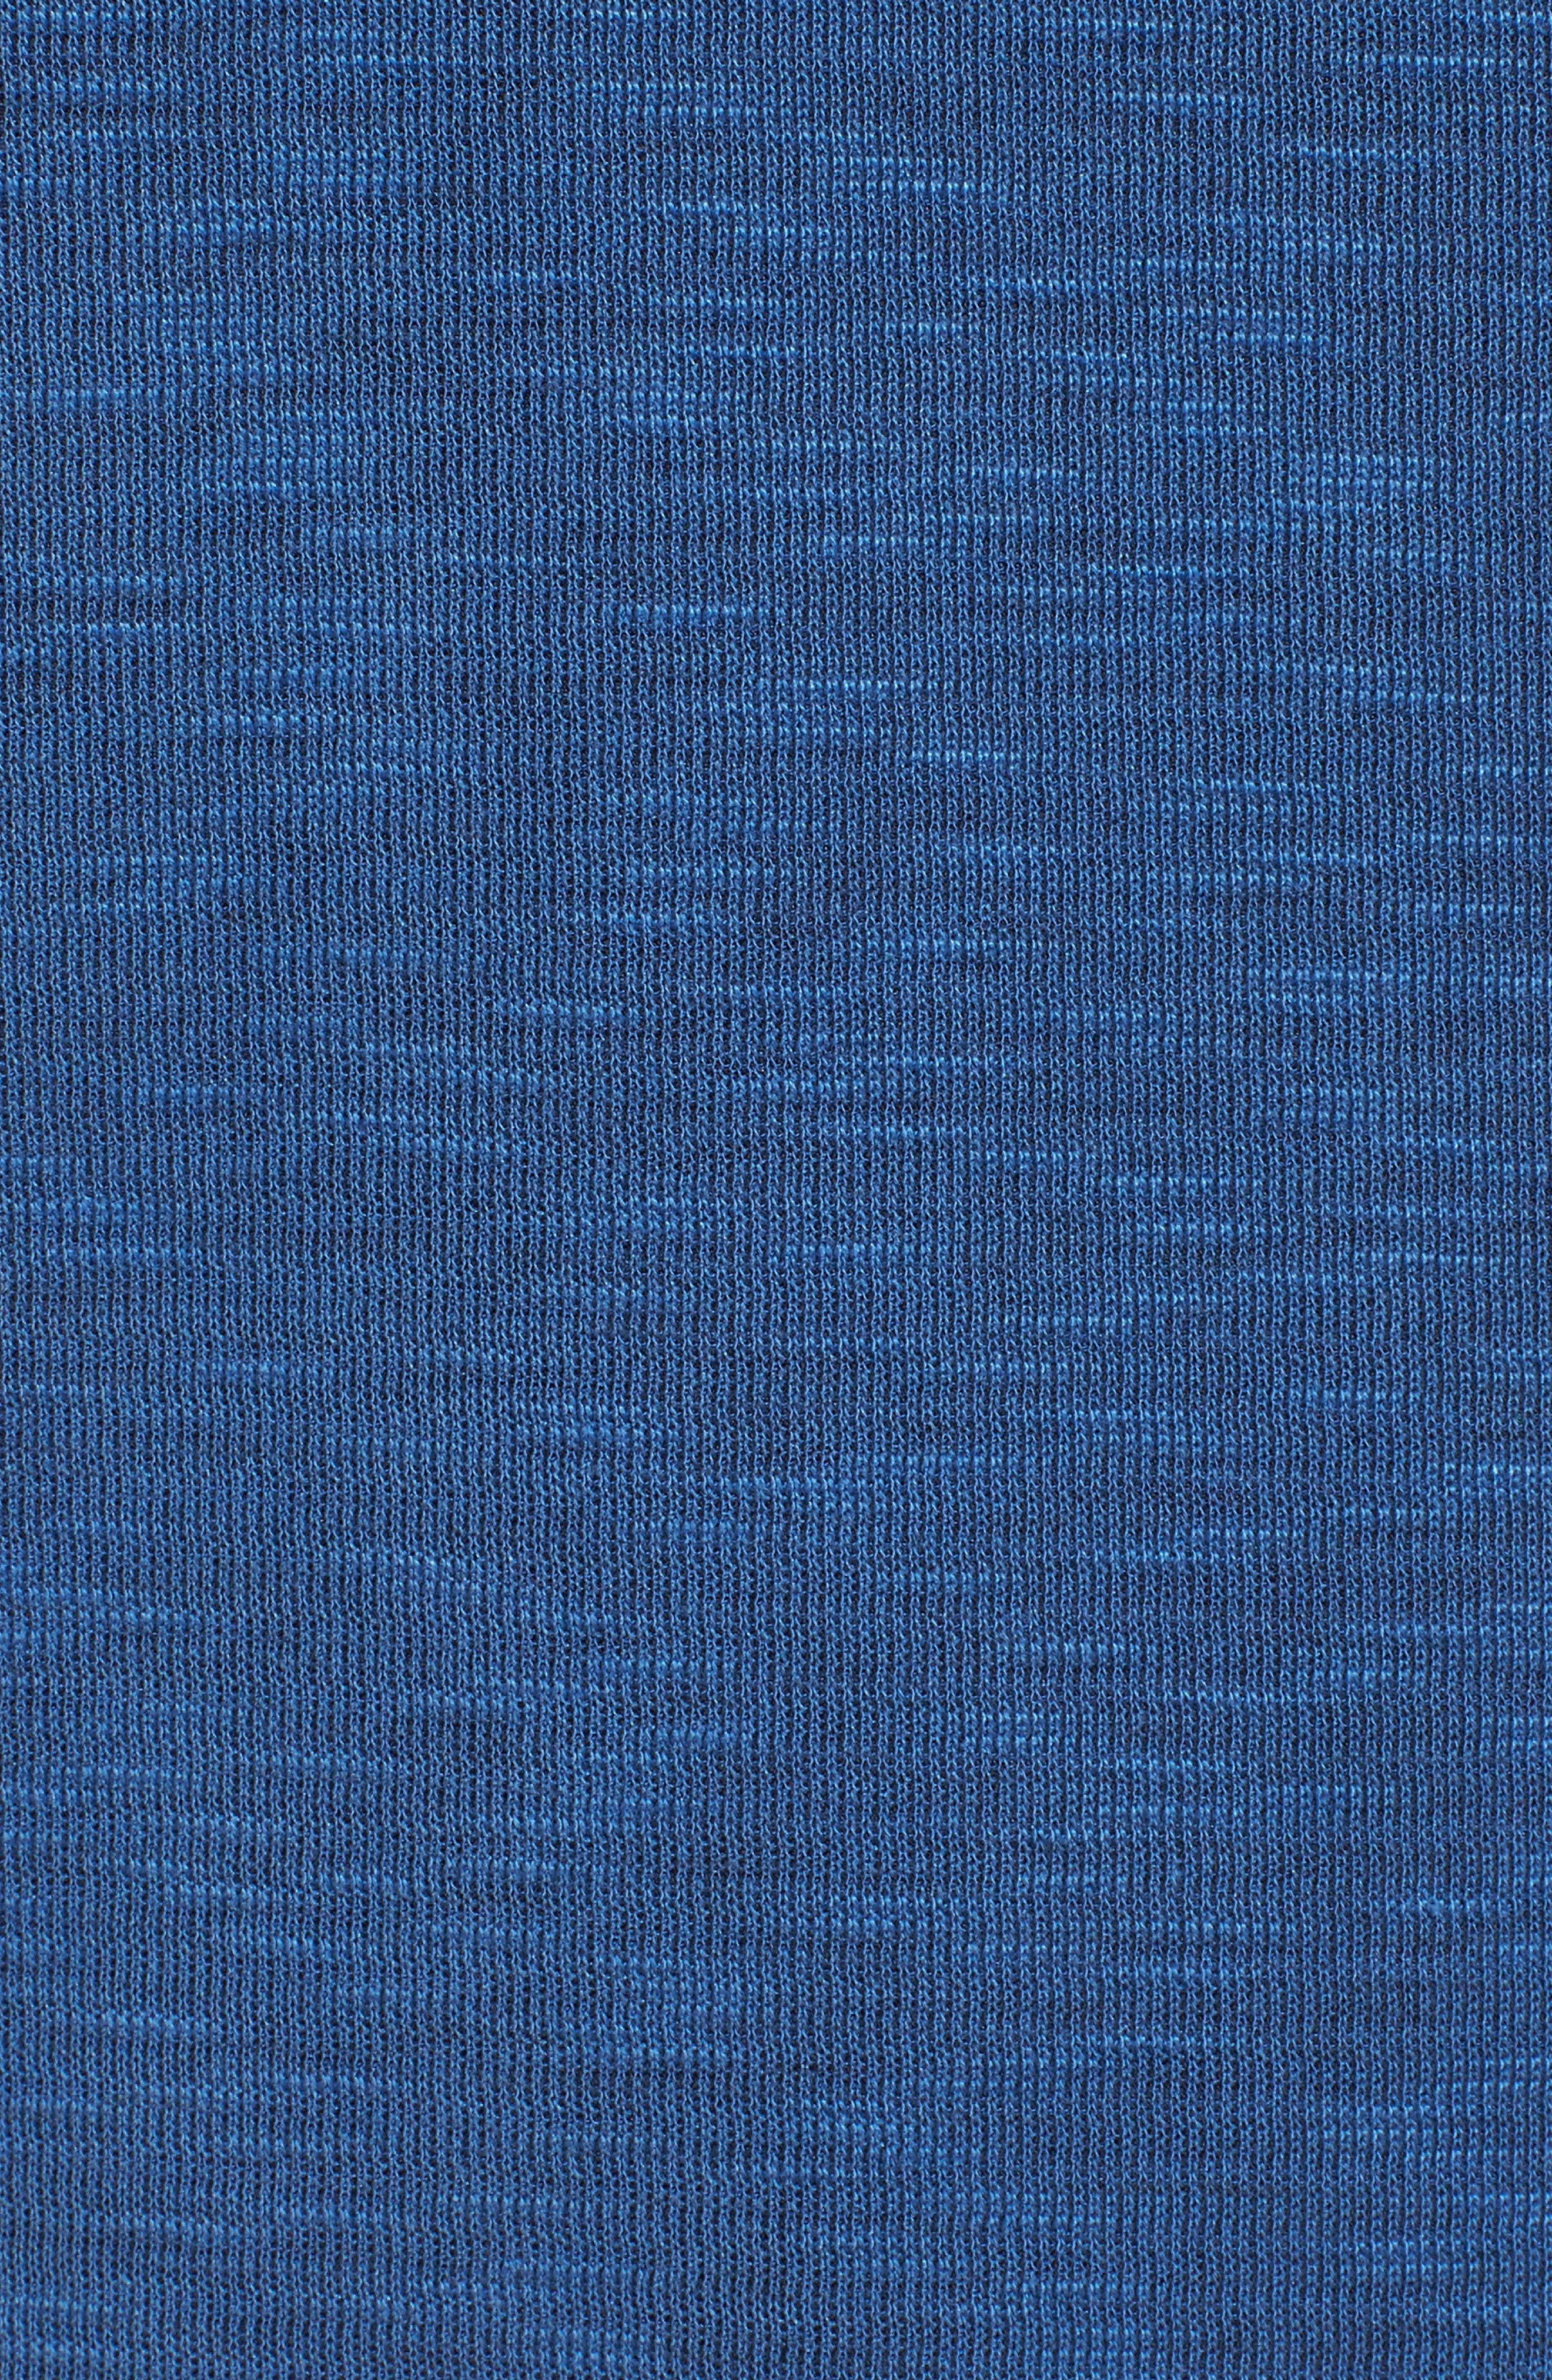 Flip Tide T-Shirt,                             Alternate thumbnail 6, color,                             Galaxy Blue